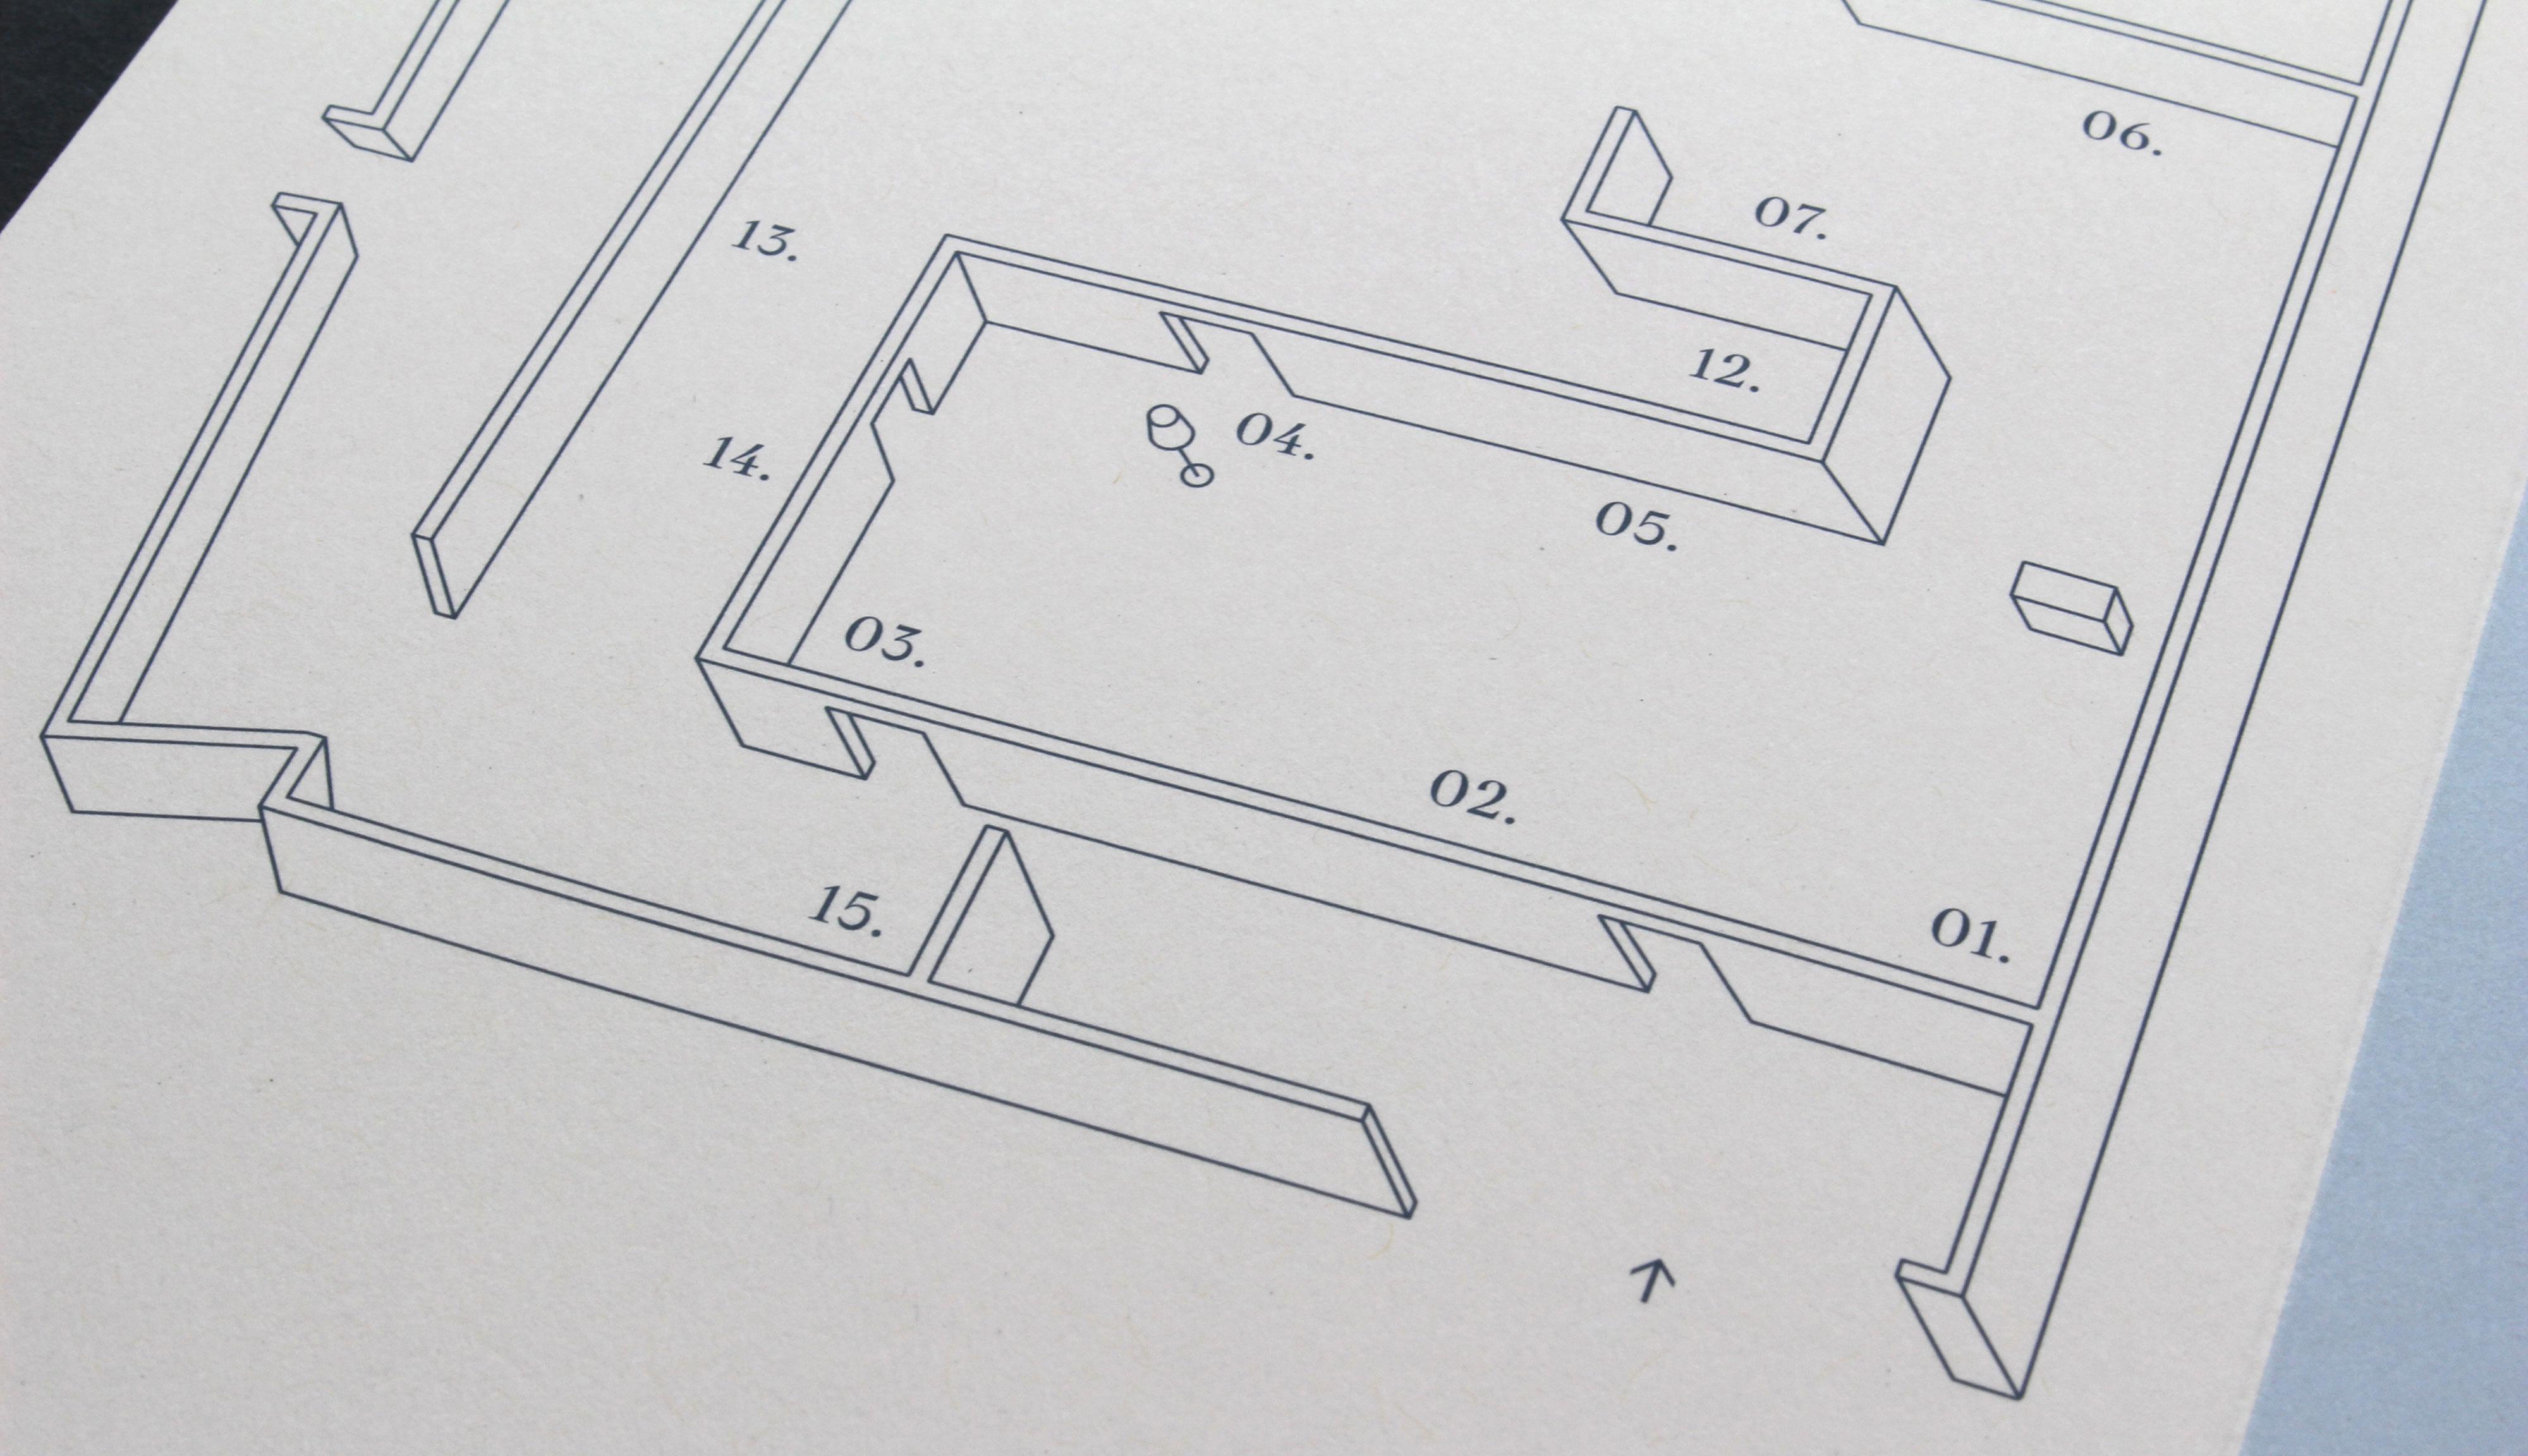 Details exhibition floor plan.